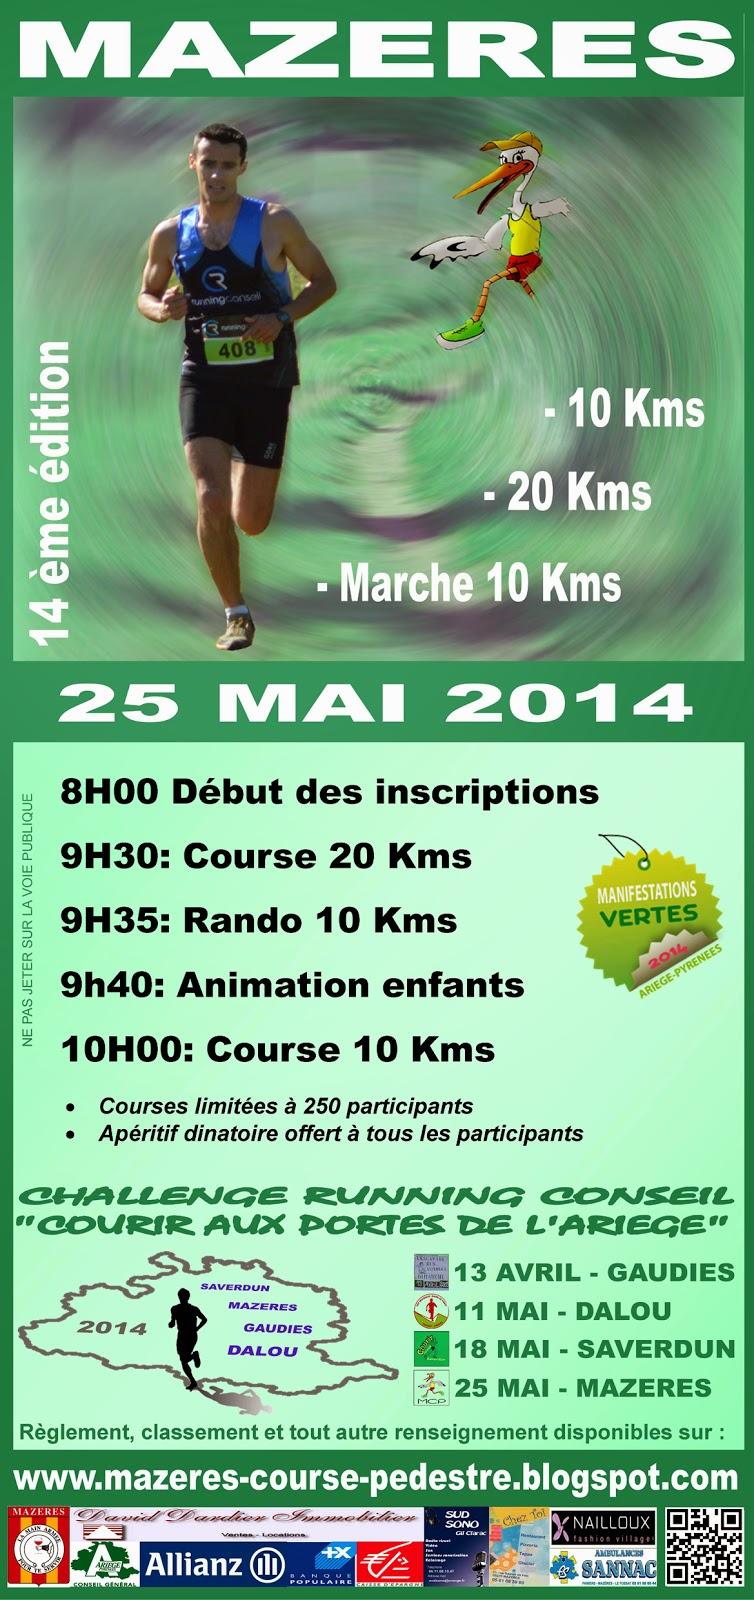 http://mazeres-course-pedestre.blogspot.fr/p/blog-page.html